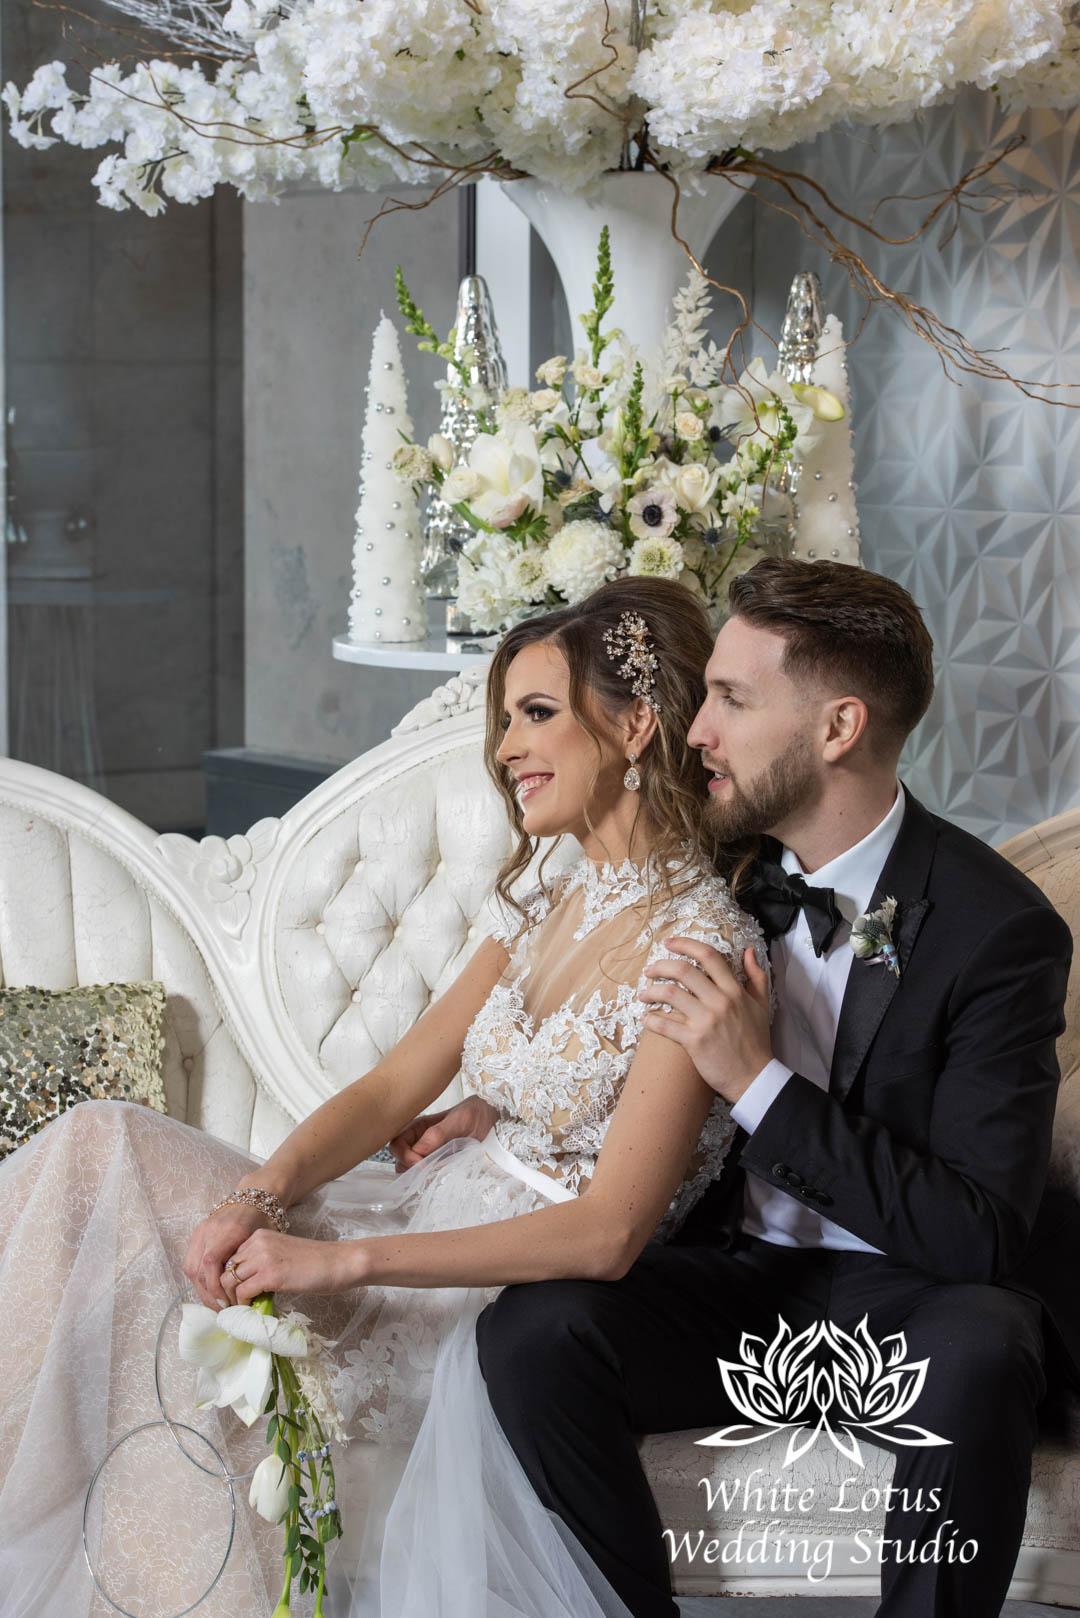 059- GLAM WINTERLUXE WEDDING INSPIRATION